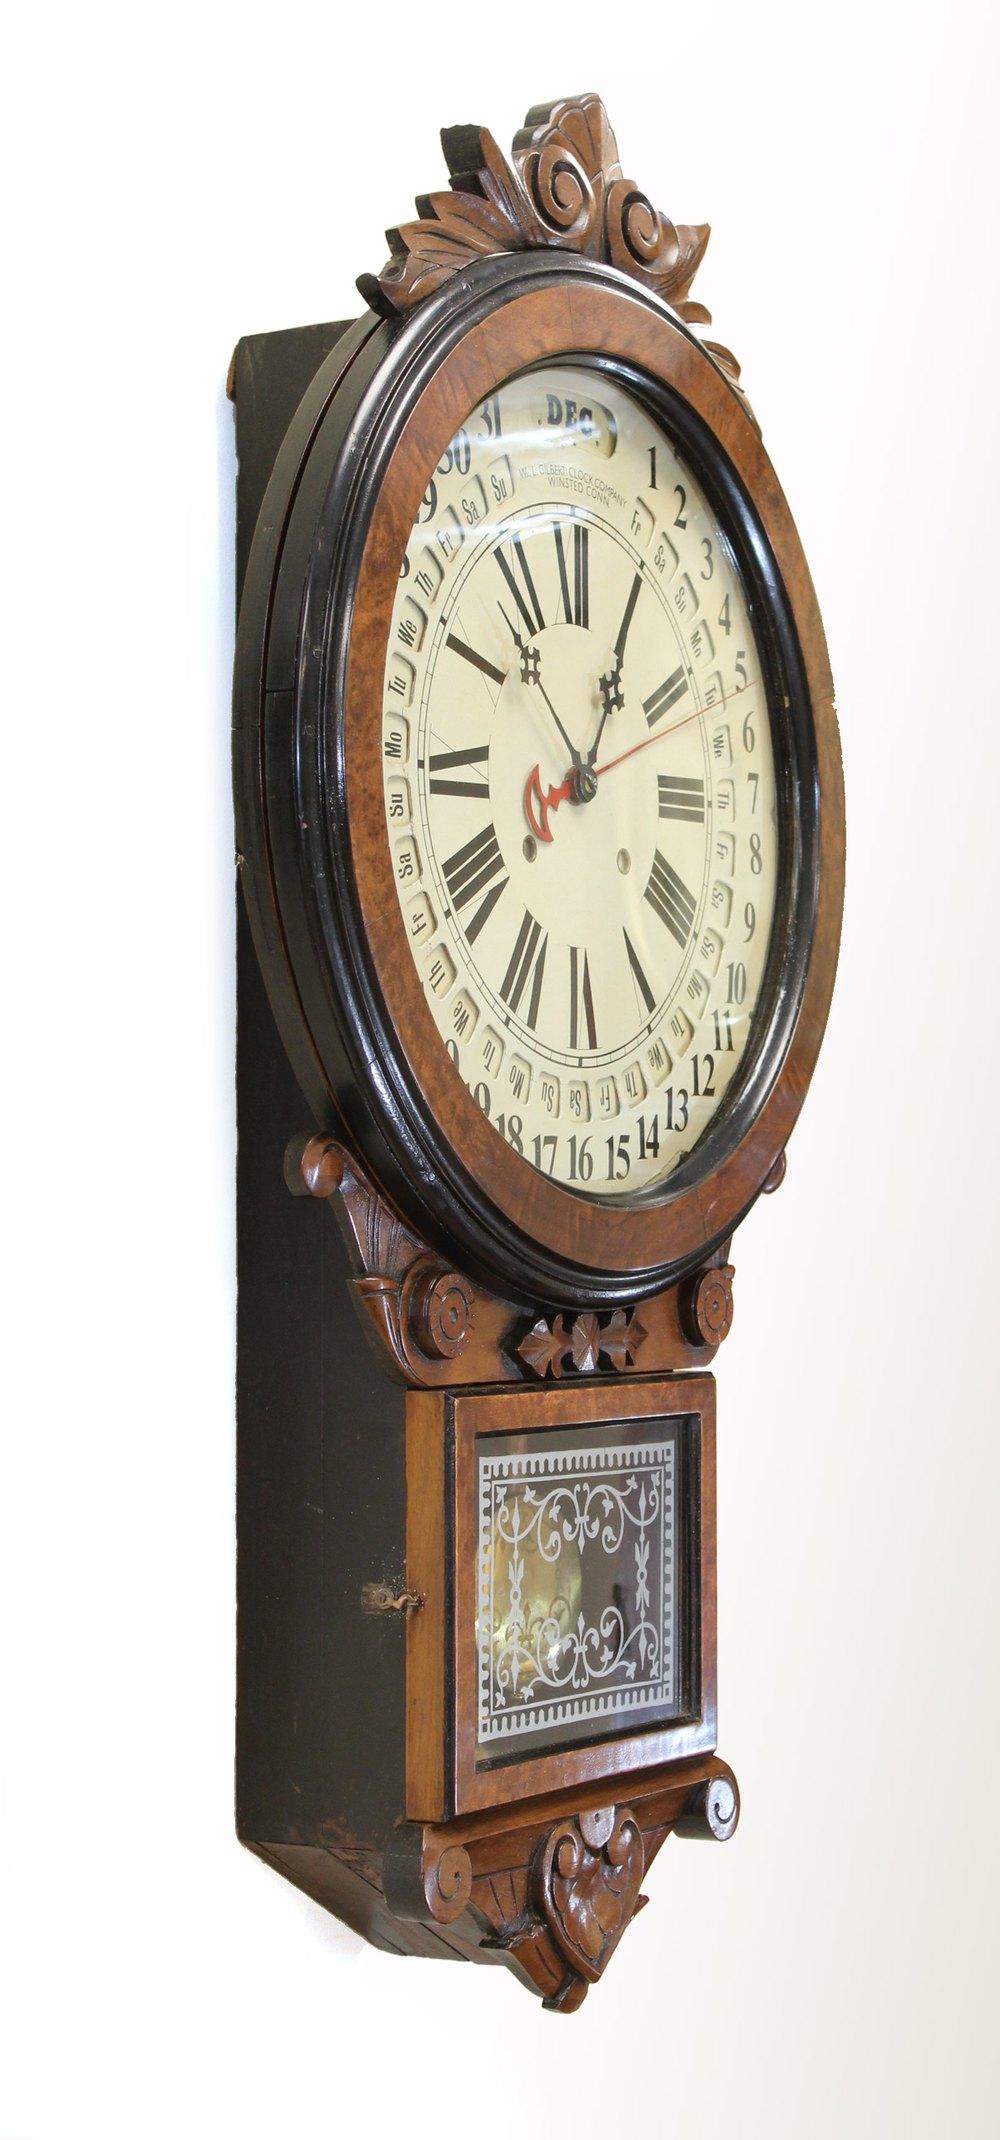 Clocksmith  Vintage and Antique Clocks